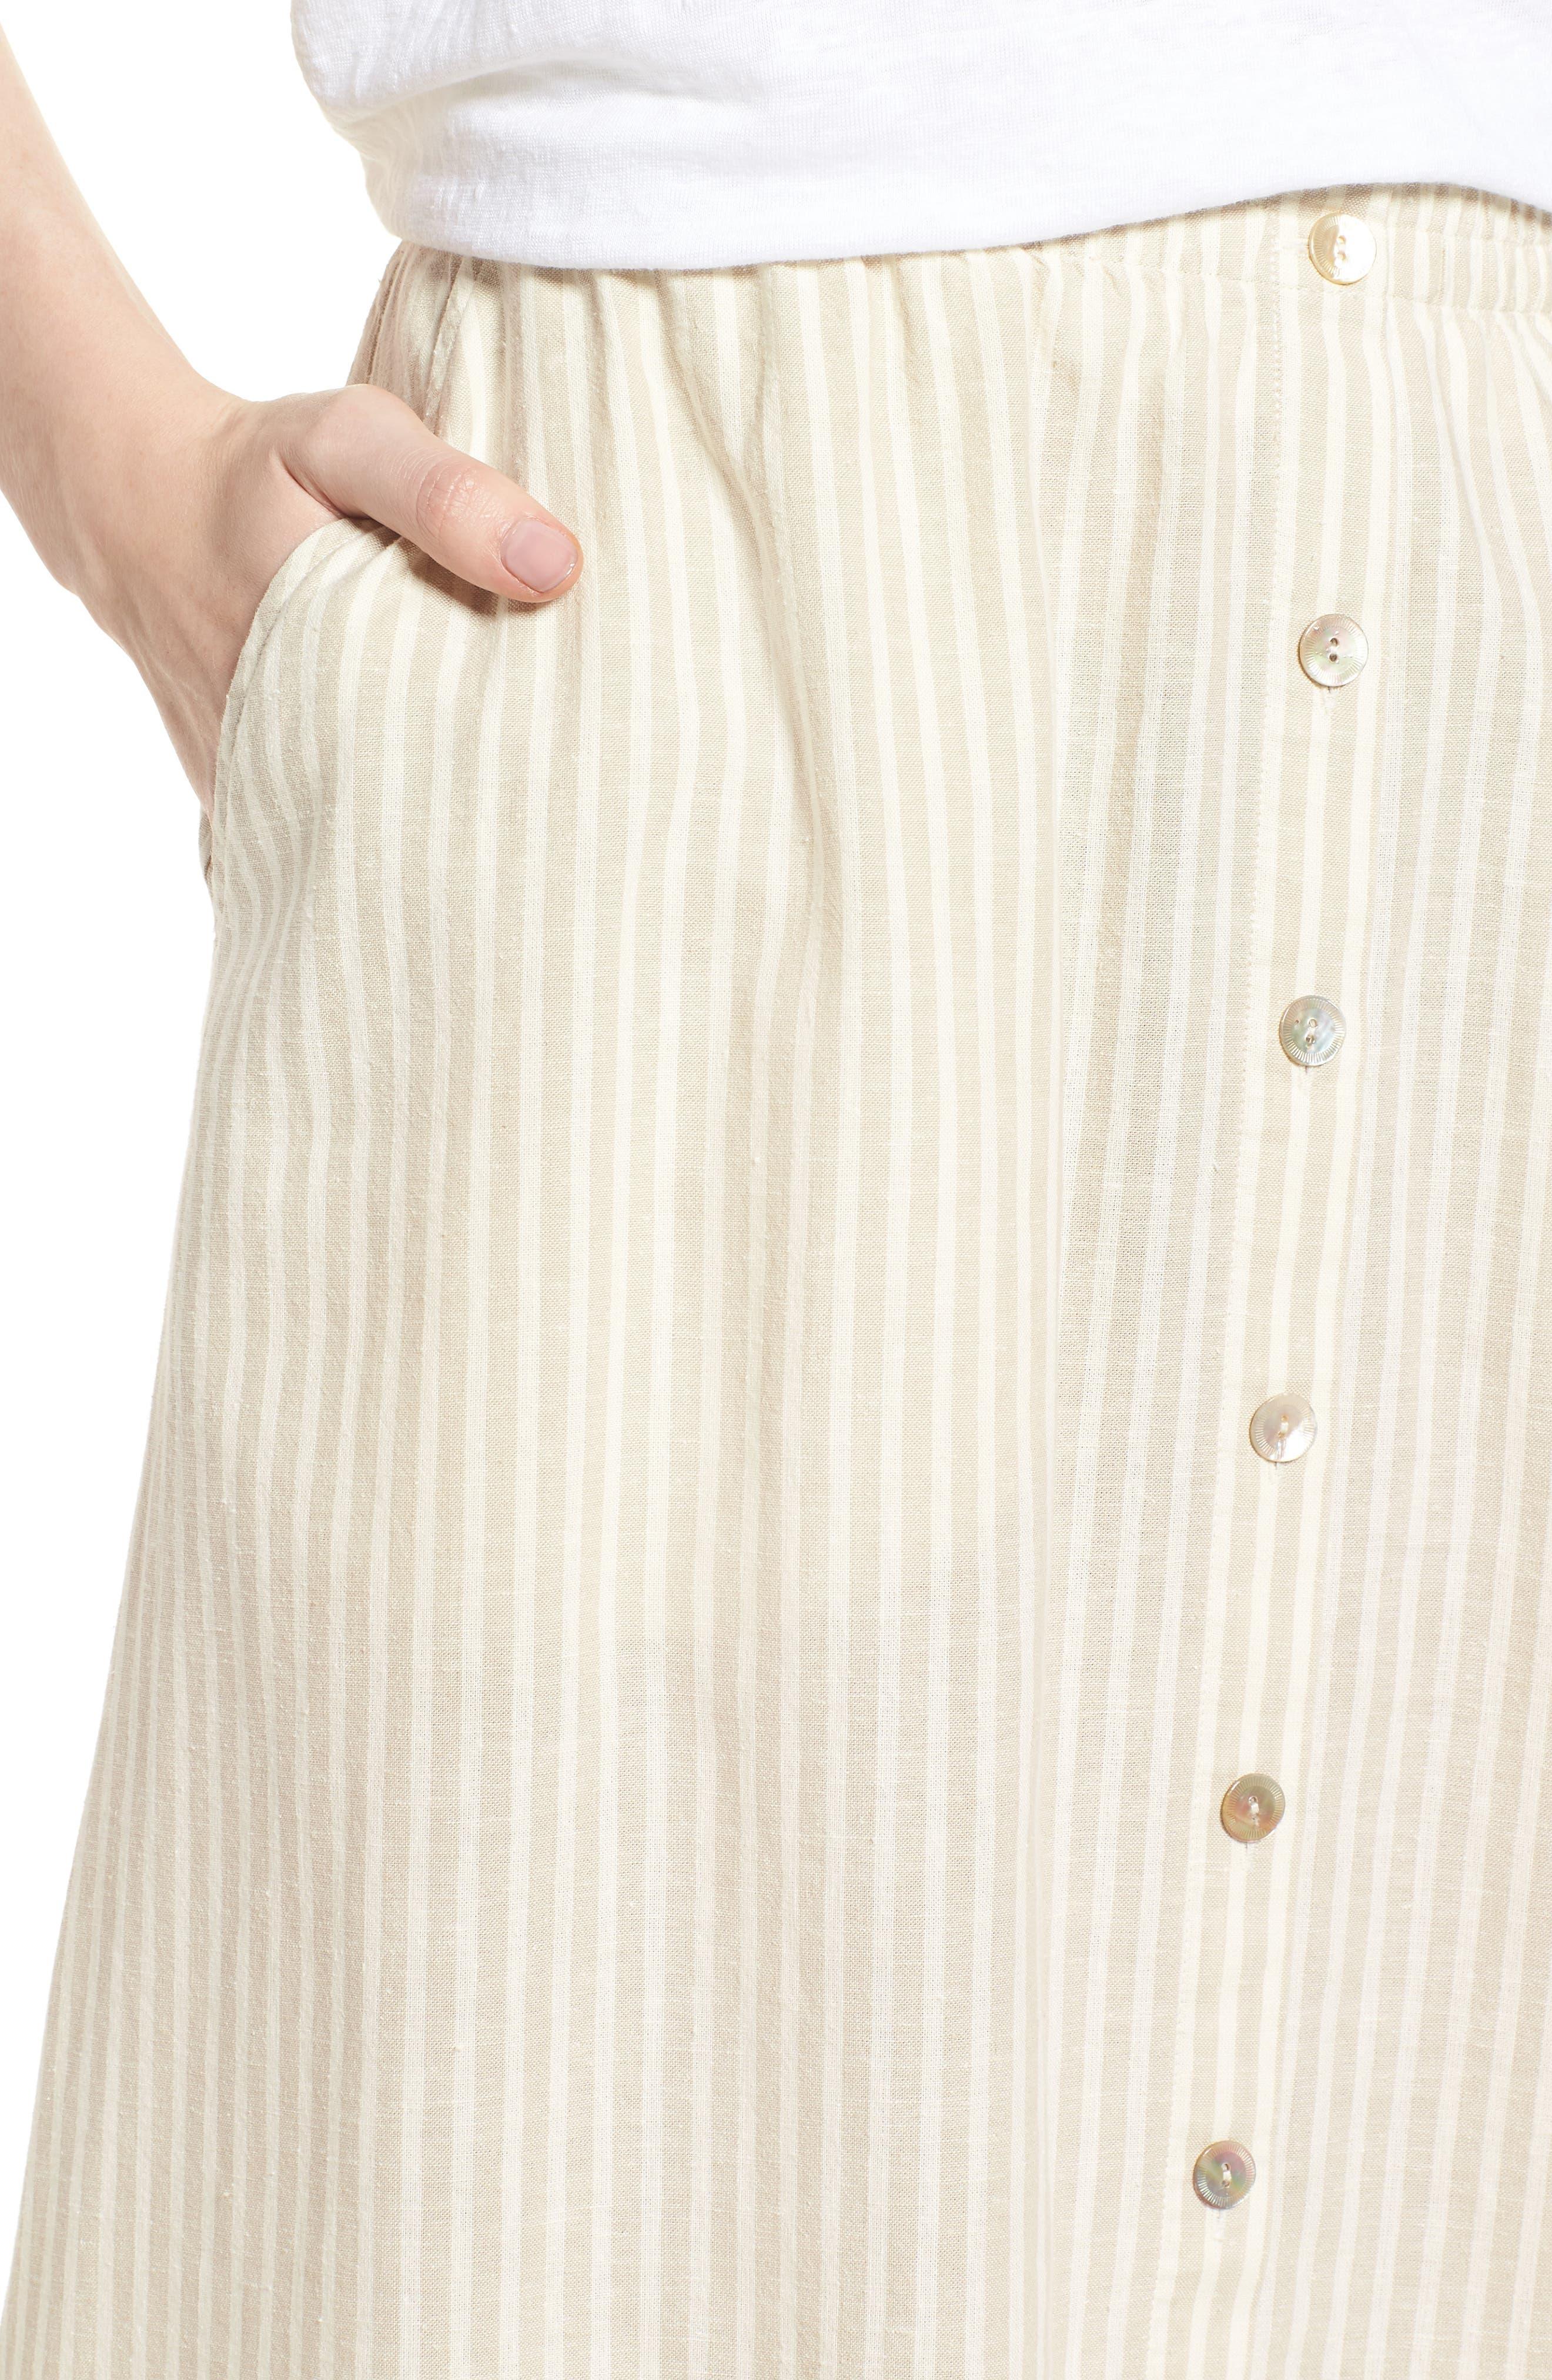 EILEEN FISHER,                             Stripe Hemp & Organic Cotton Midi Skirt,                             Alternate thumbnail 4, color,                             257